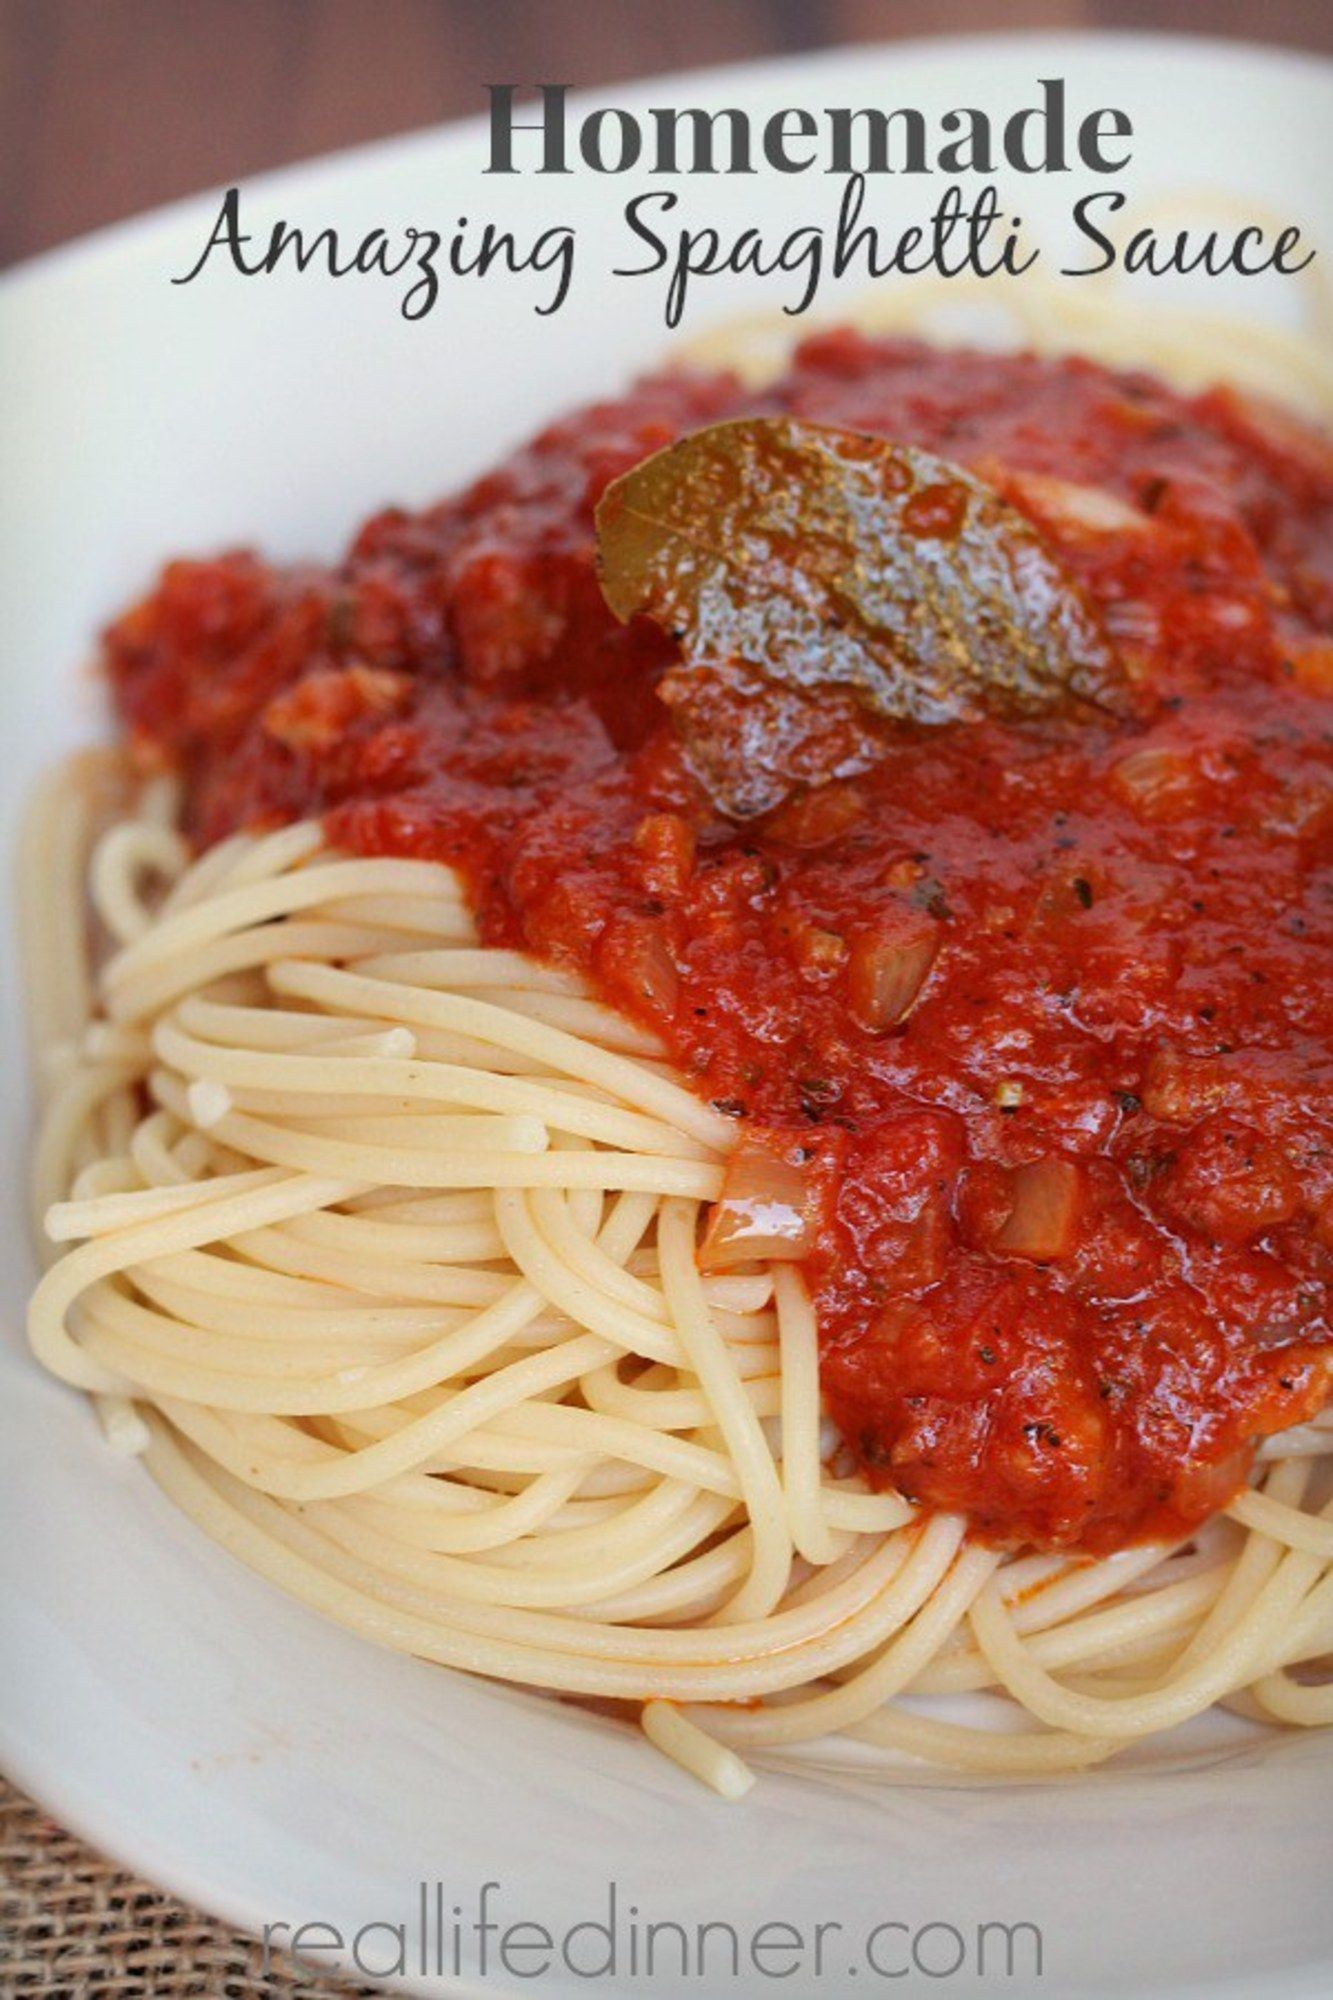 Amazing Spaghetti Sauce Recipe Spaghetti Sauce Recipe Homemade Spaghetti Homemade Spaghetti Sauce